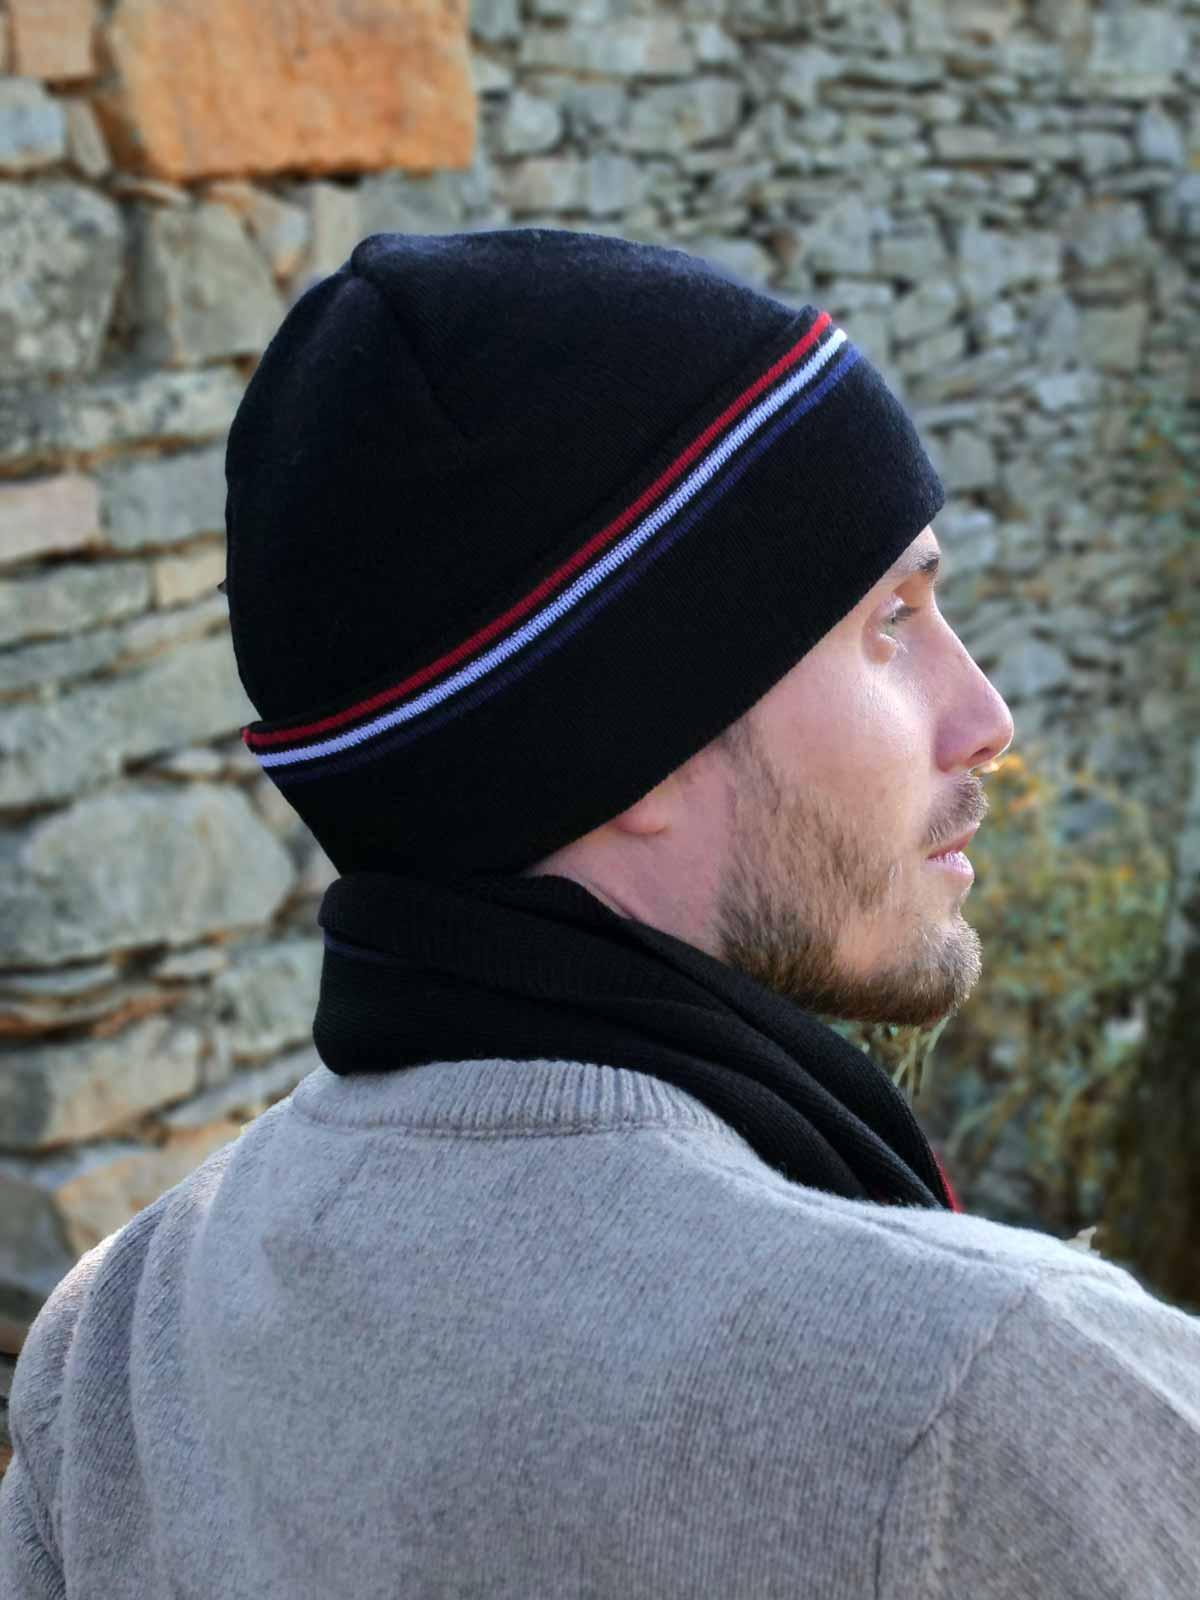 bonnet-made-in-france-le-givre-noir-2